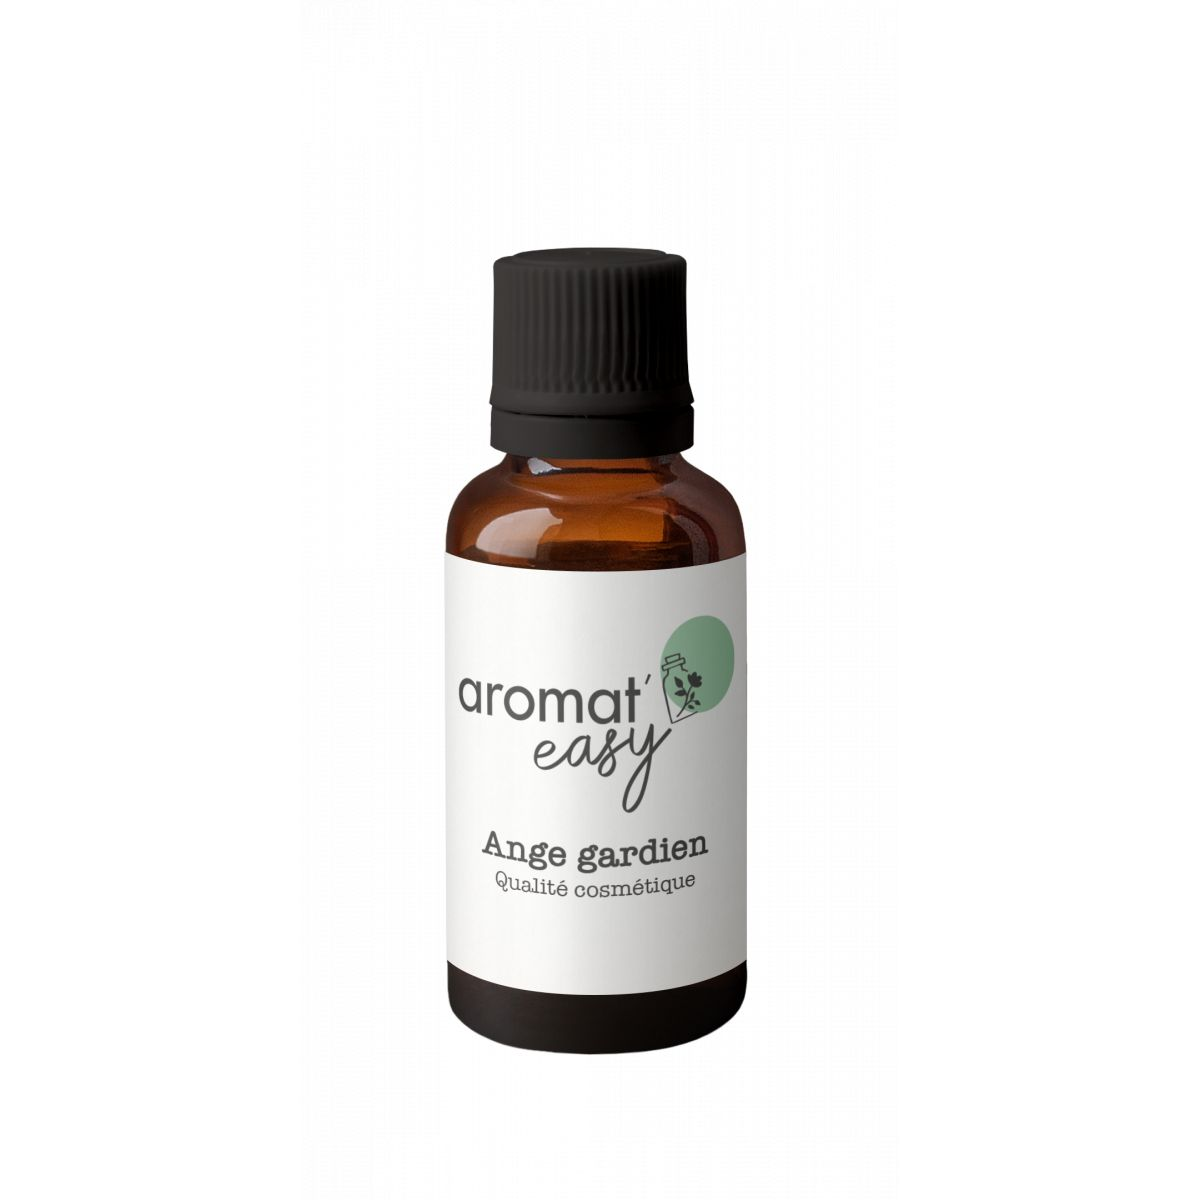 Fragrance Ange gardien